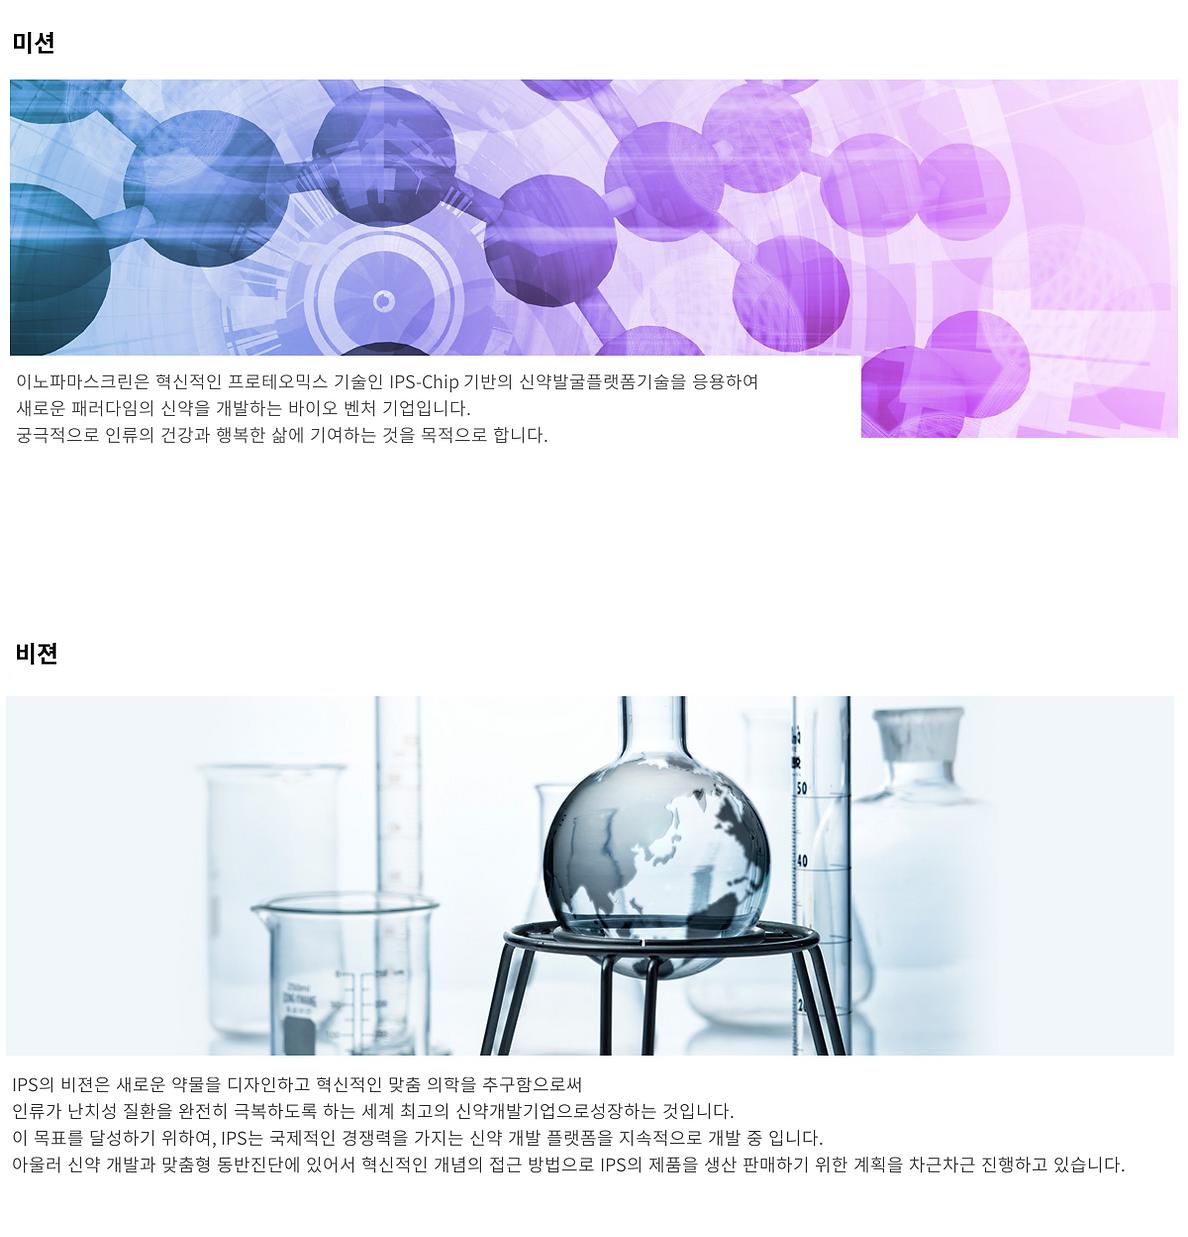 COMPANY MISSION & VISION 한글번역210423-1.PN